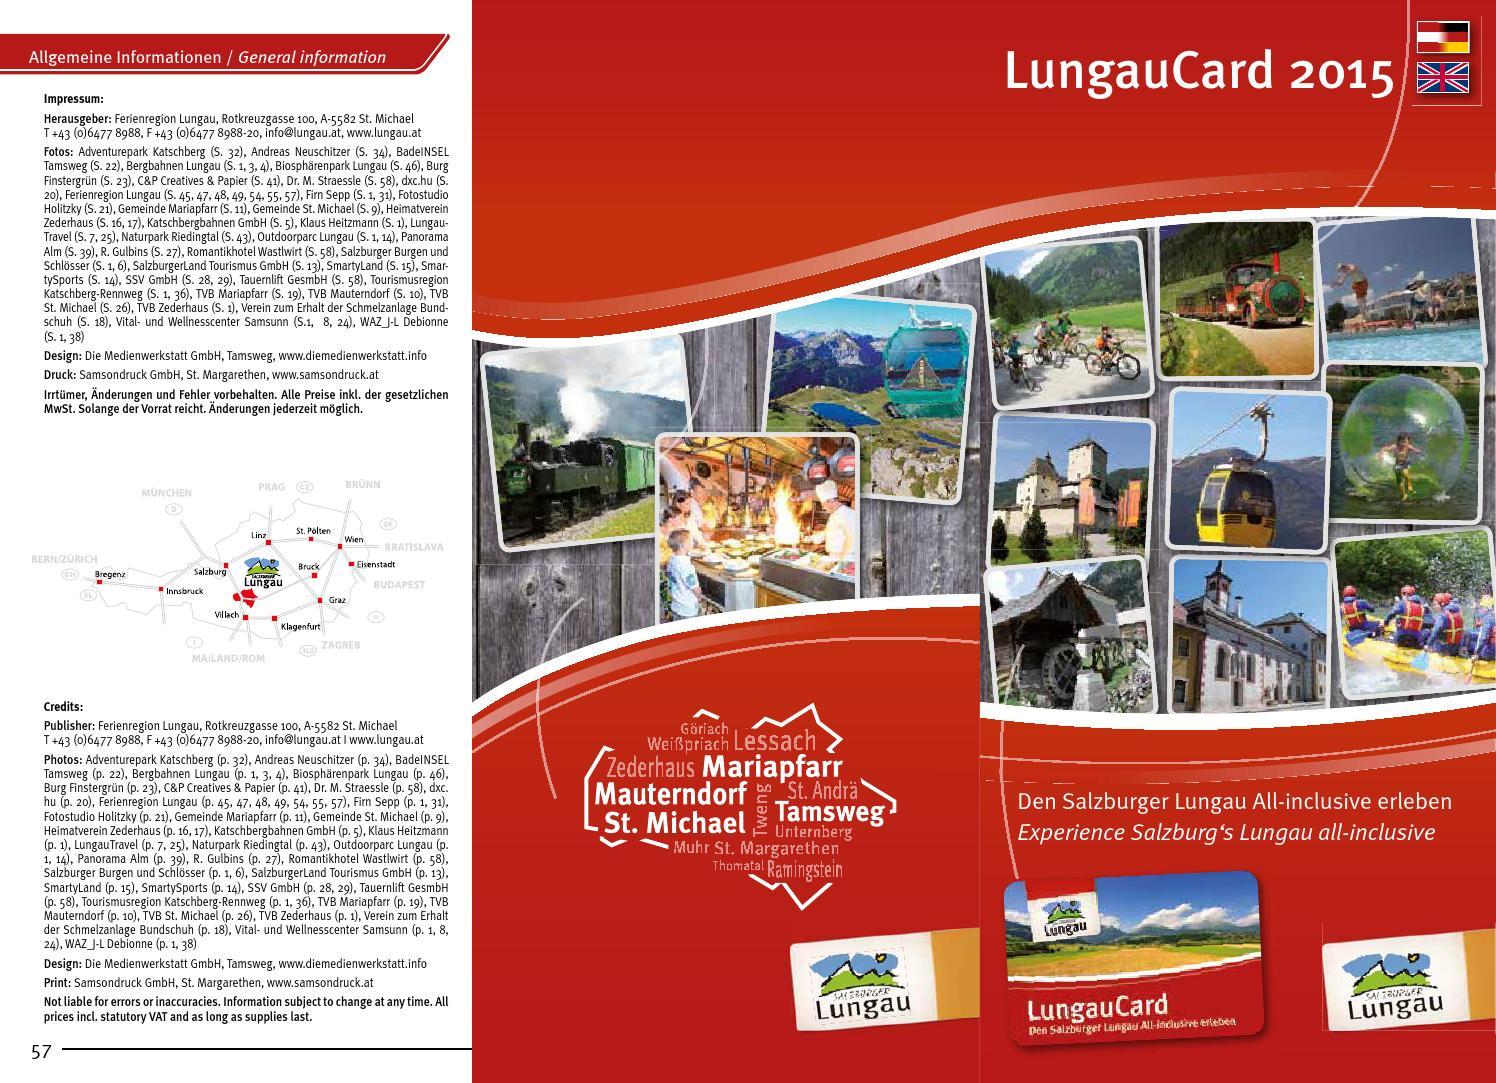 Lungaucard Broschüre 2015 by Ferienregion Lungau issuu